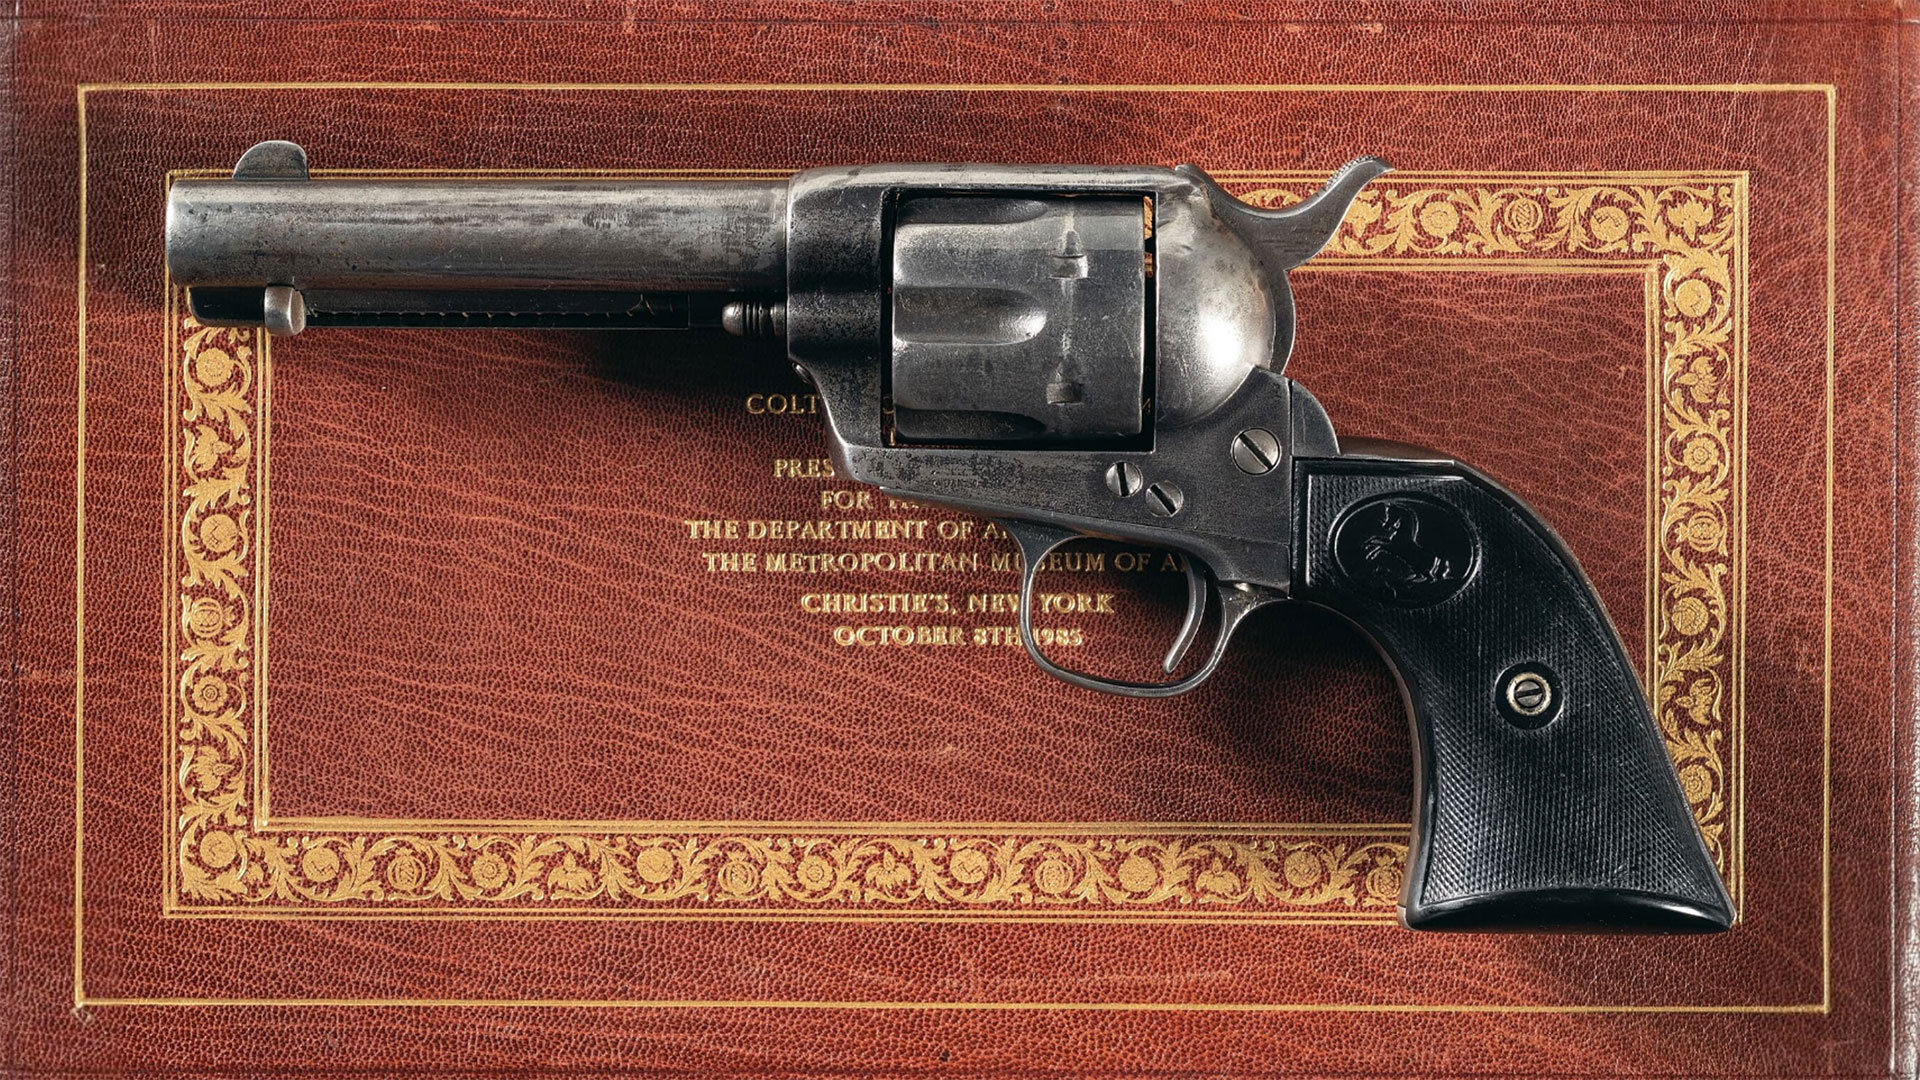 Antique-Colt-Black-Powder-Frame-Single-Action-Army-Revolver-Gene-Autry